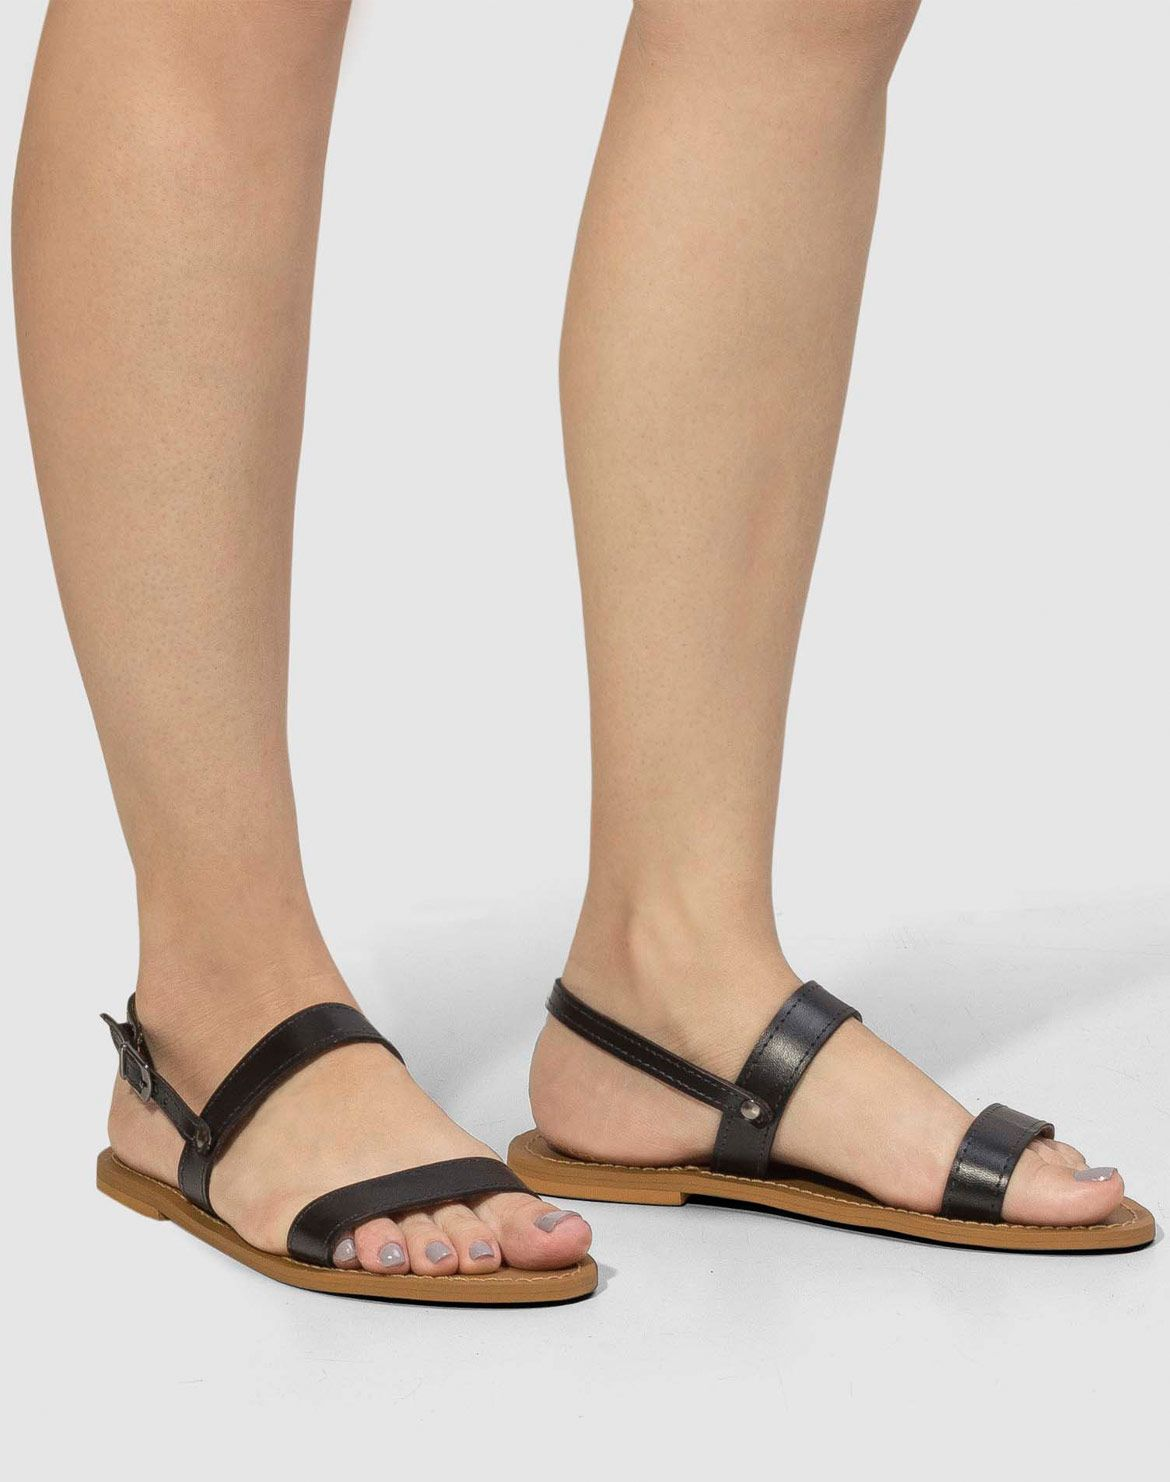 Palma SandalenVegane Und Schwarz37 Sandale 3 Schuhe QrxBoedCWE